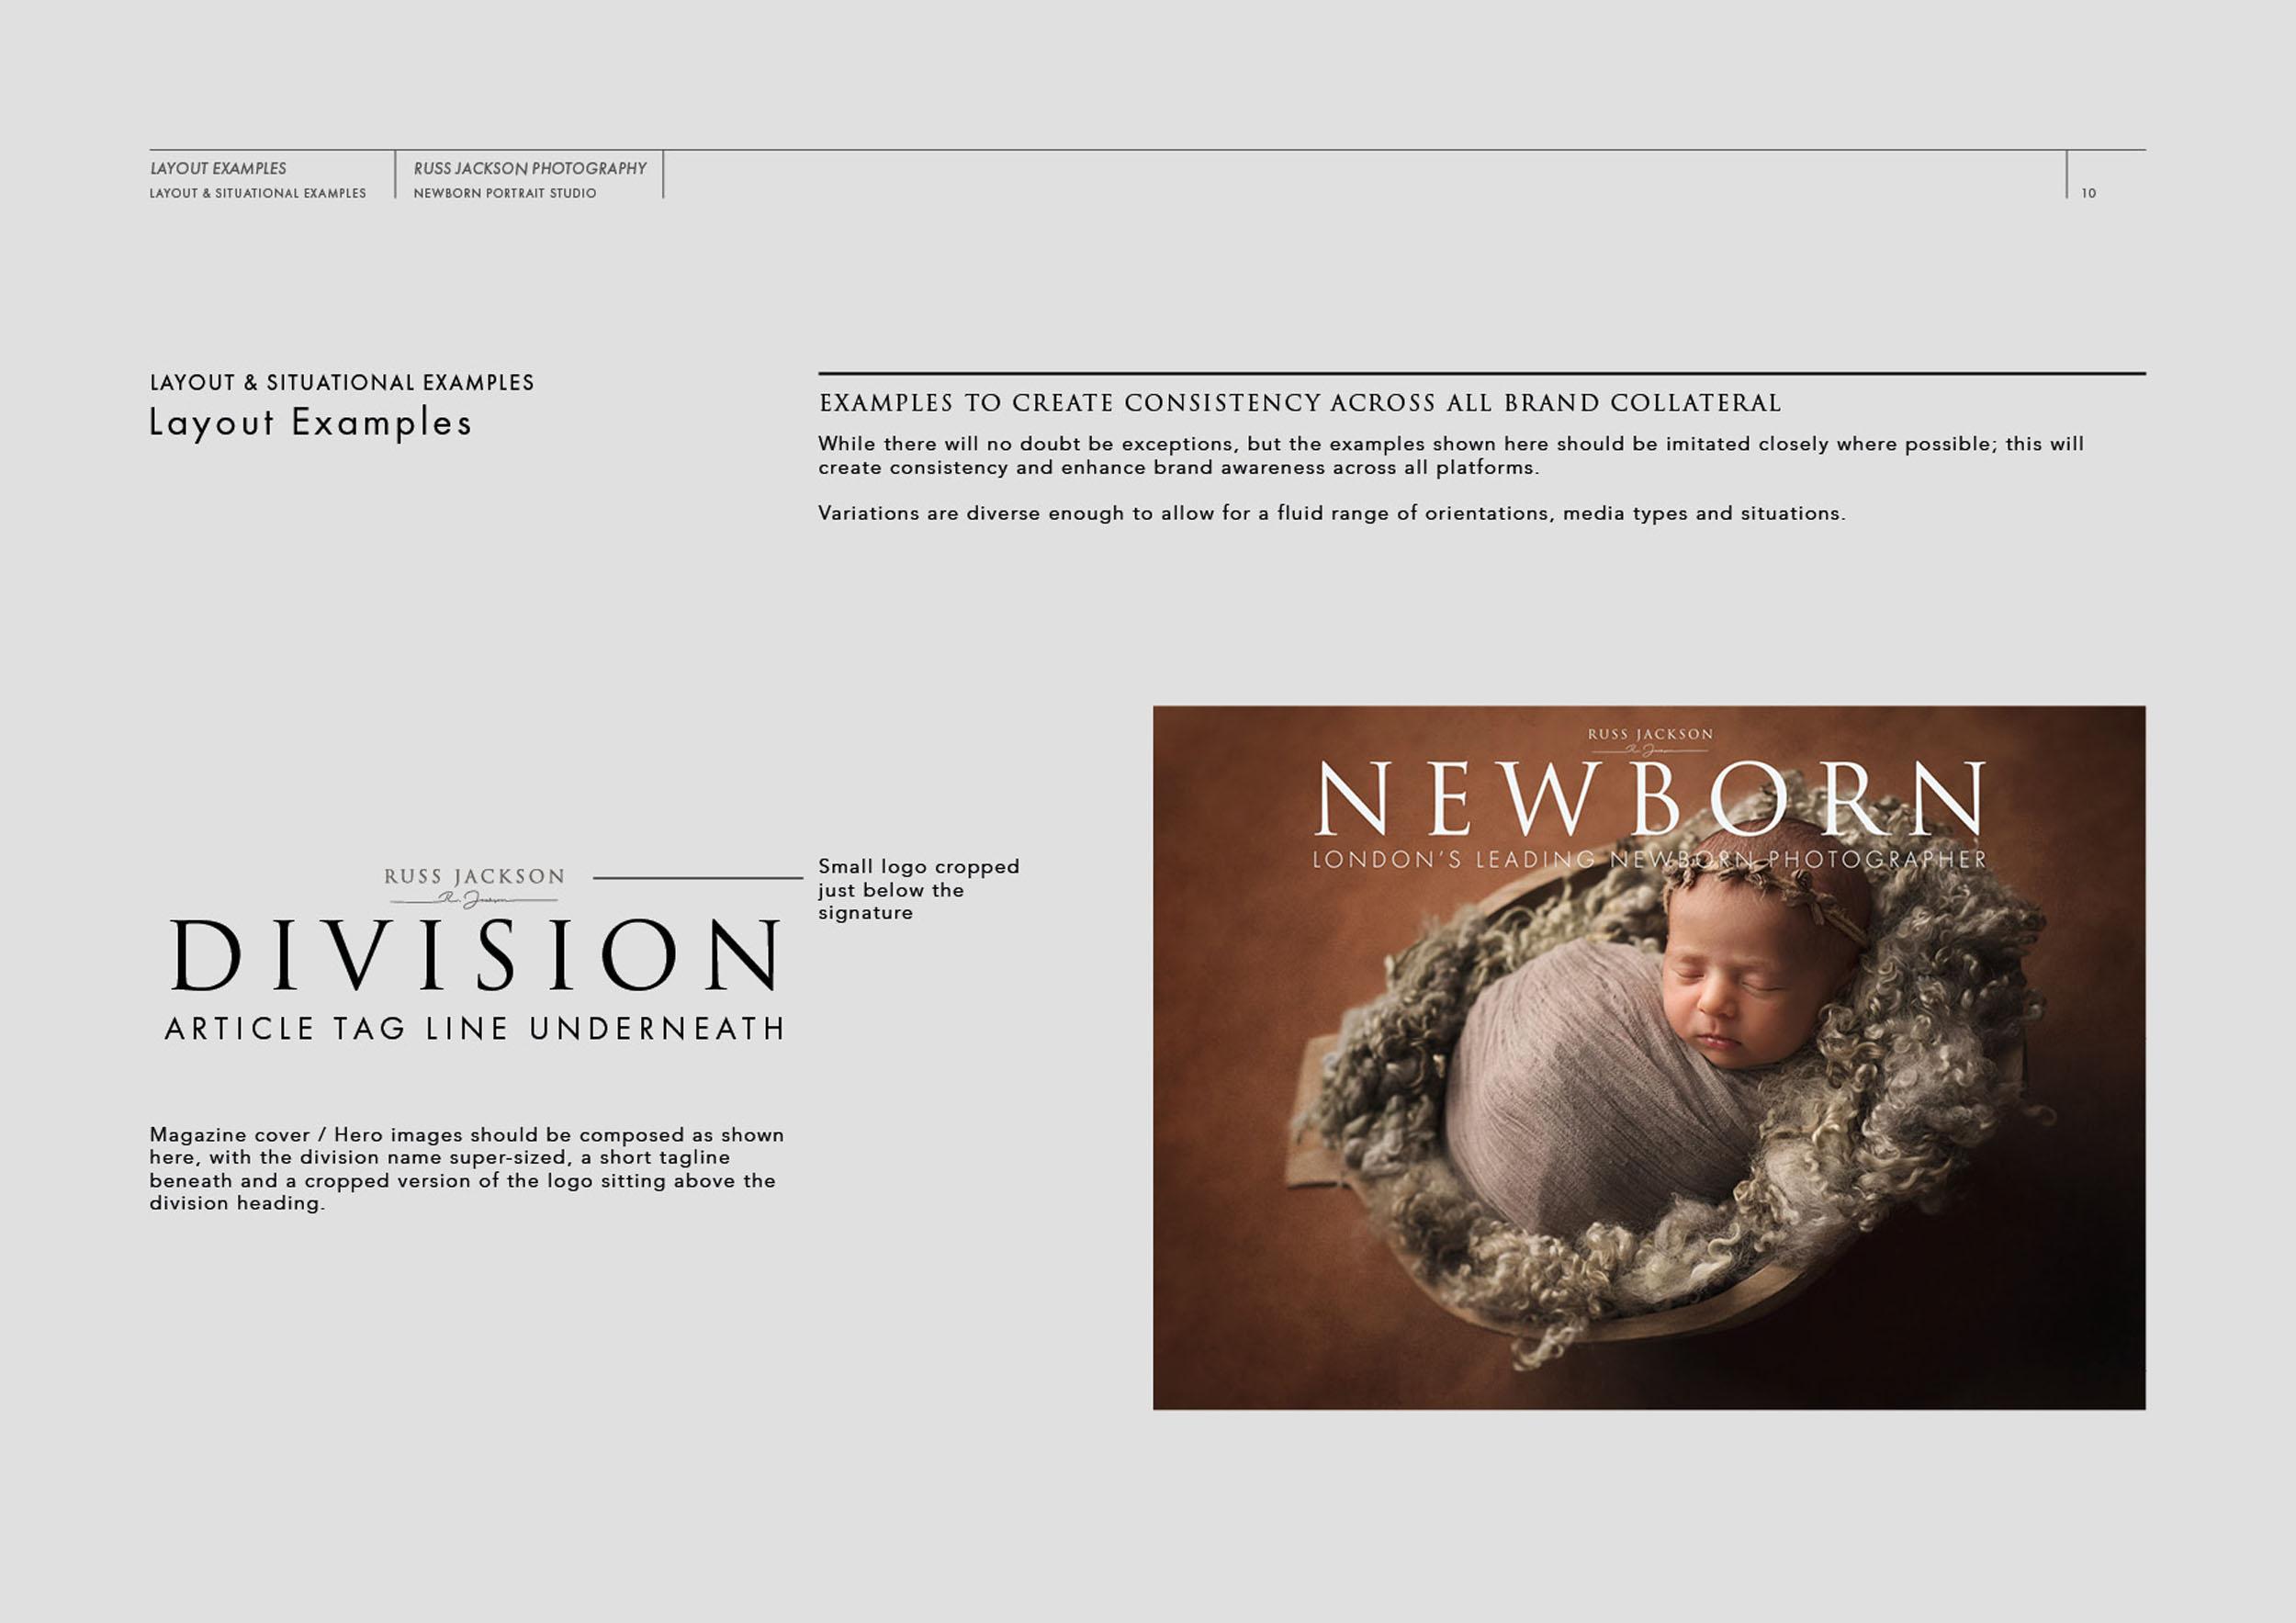 russ-jackson-newborn-photography-branding-10